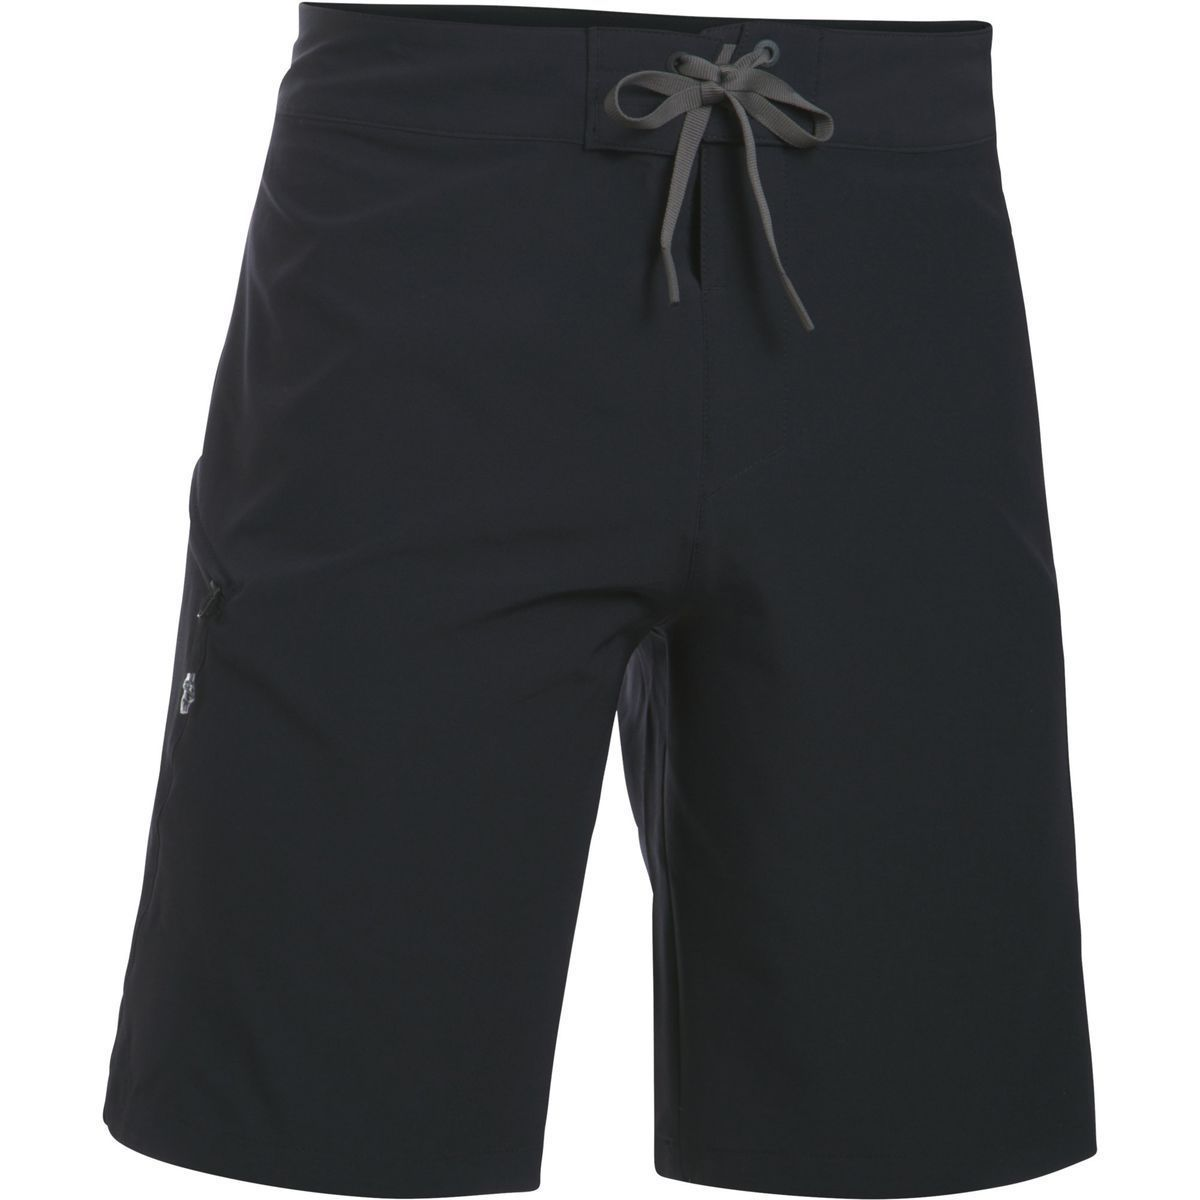 bcb0df2e1dbbf Swimwear 15690  New Under Armour Reblek Boardshorts Mens 32-38 Black Swim  Shorts Free